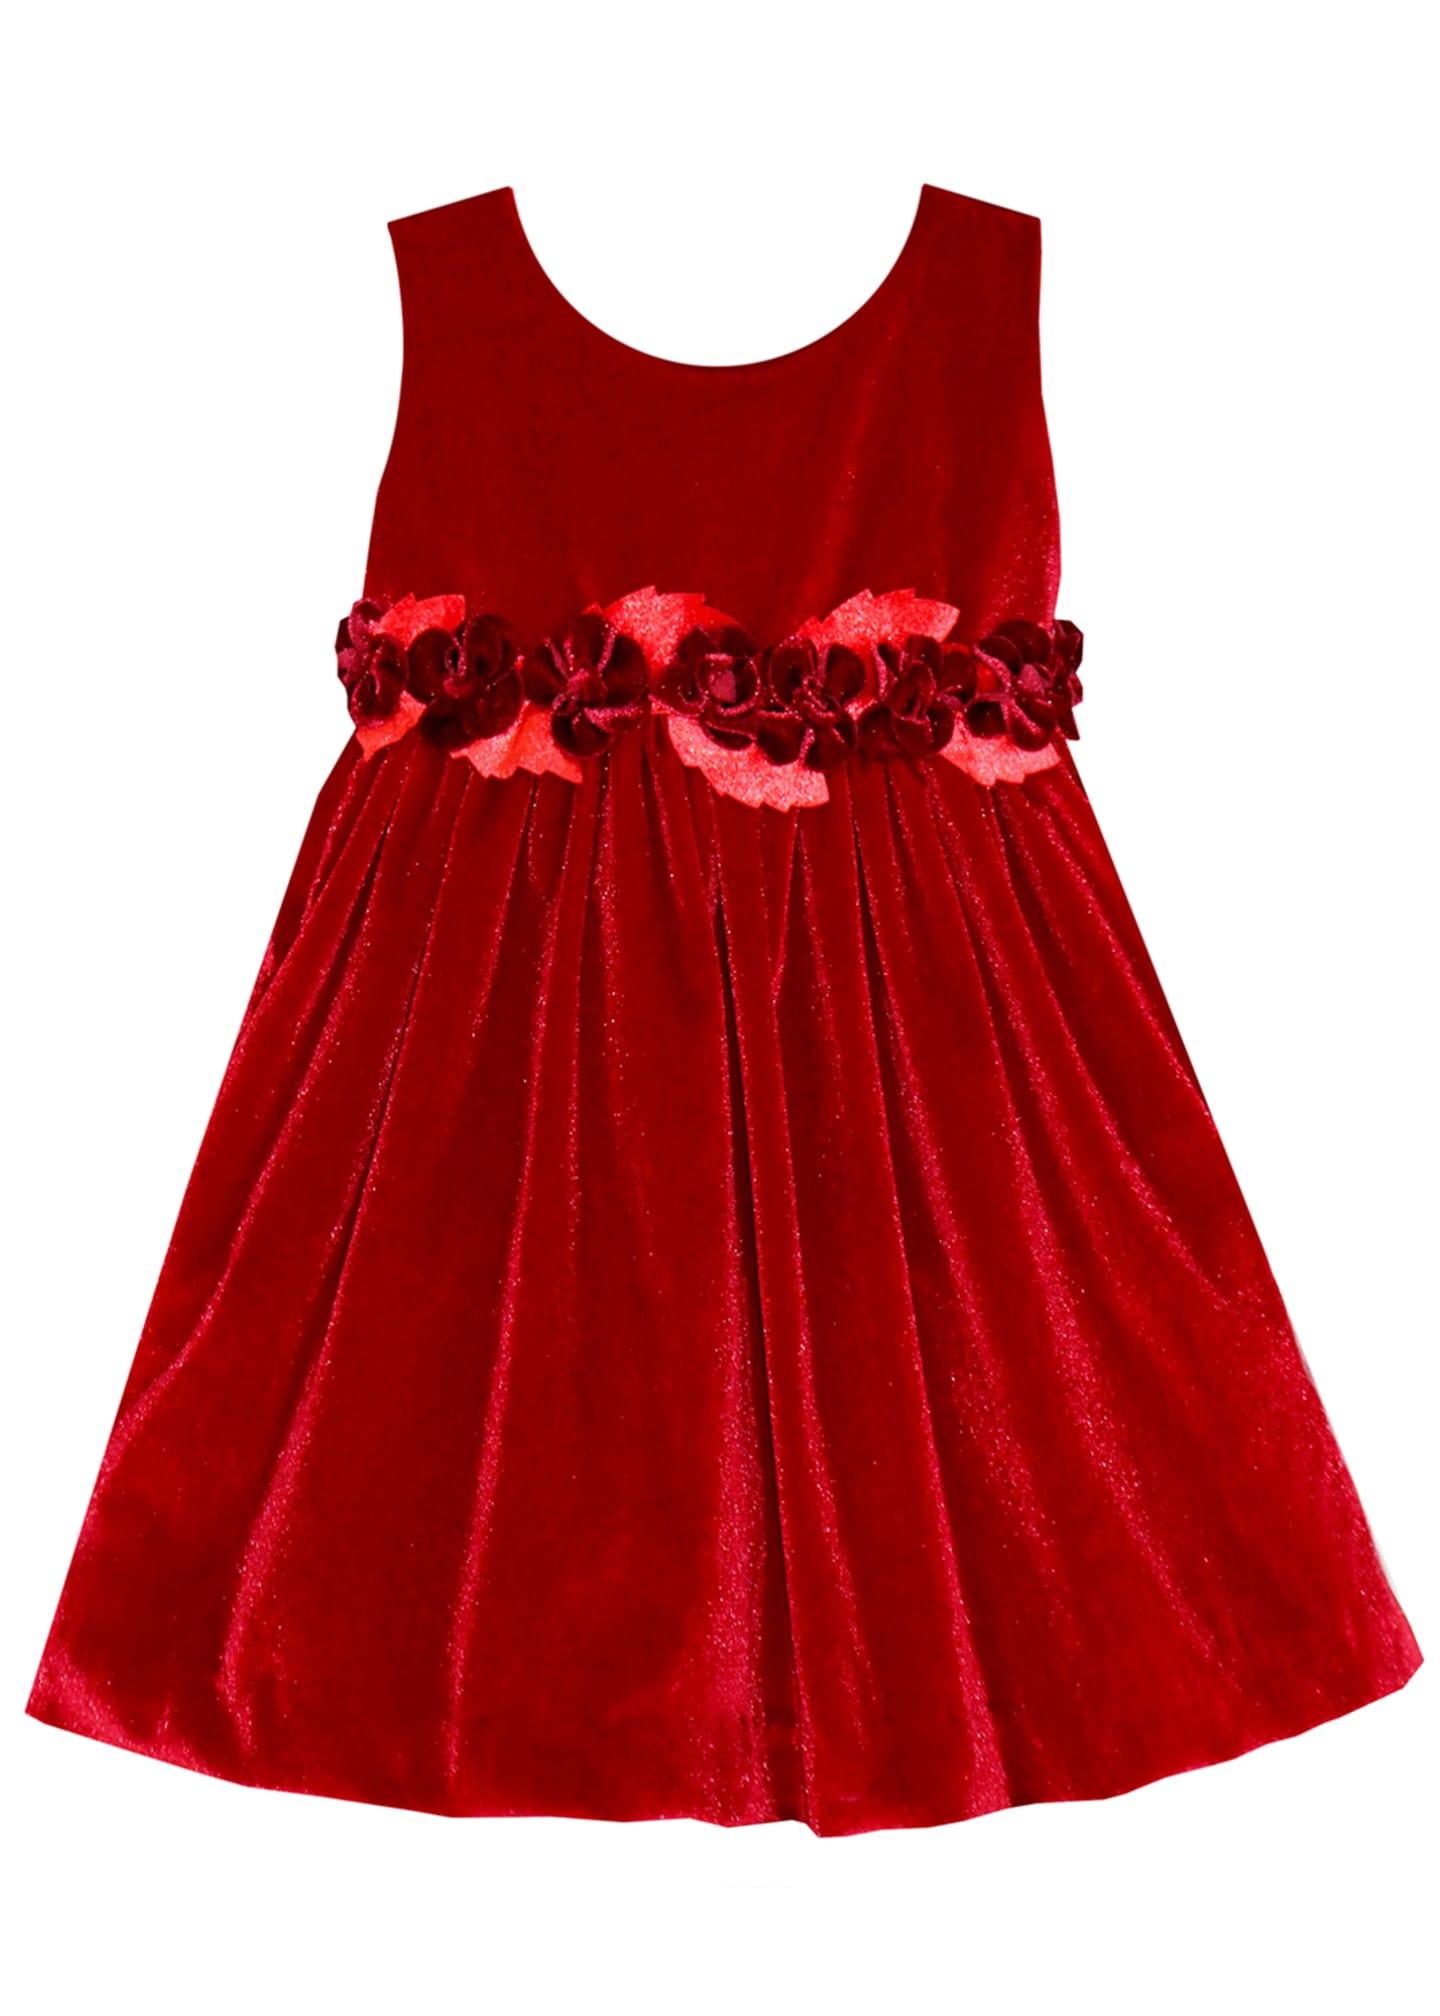 Isabel Garreton Sleeveless Velvet Holiday Dress w/ Rose